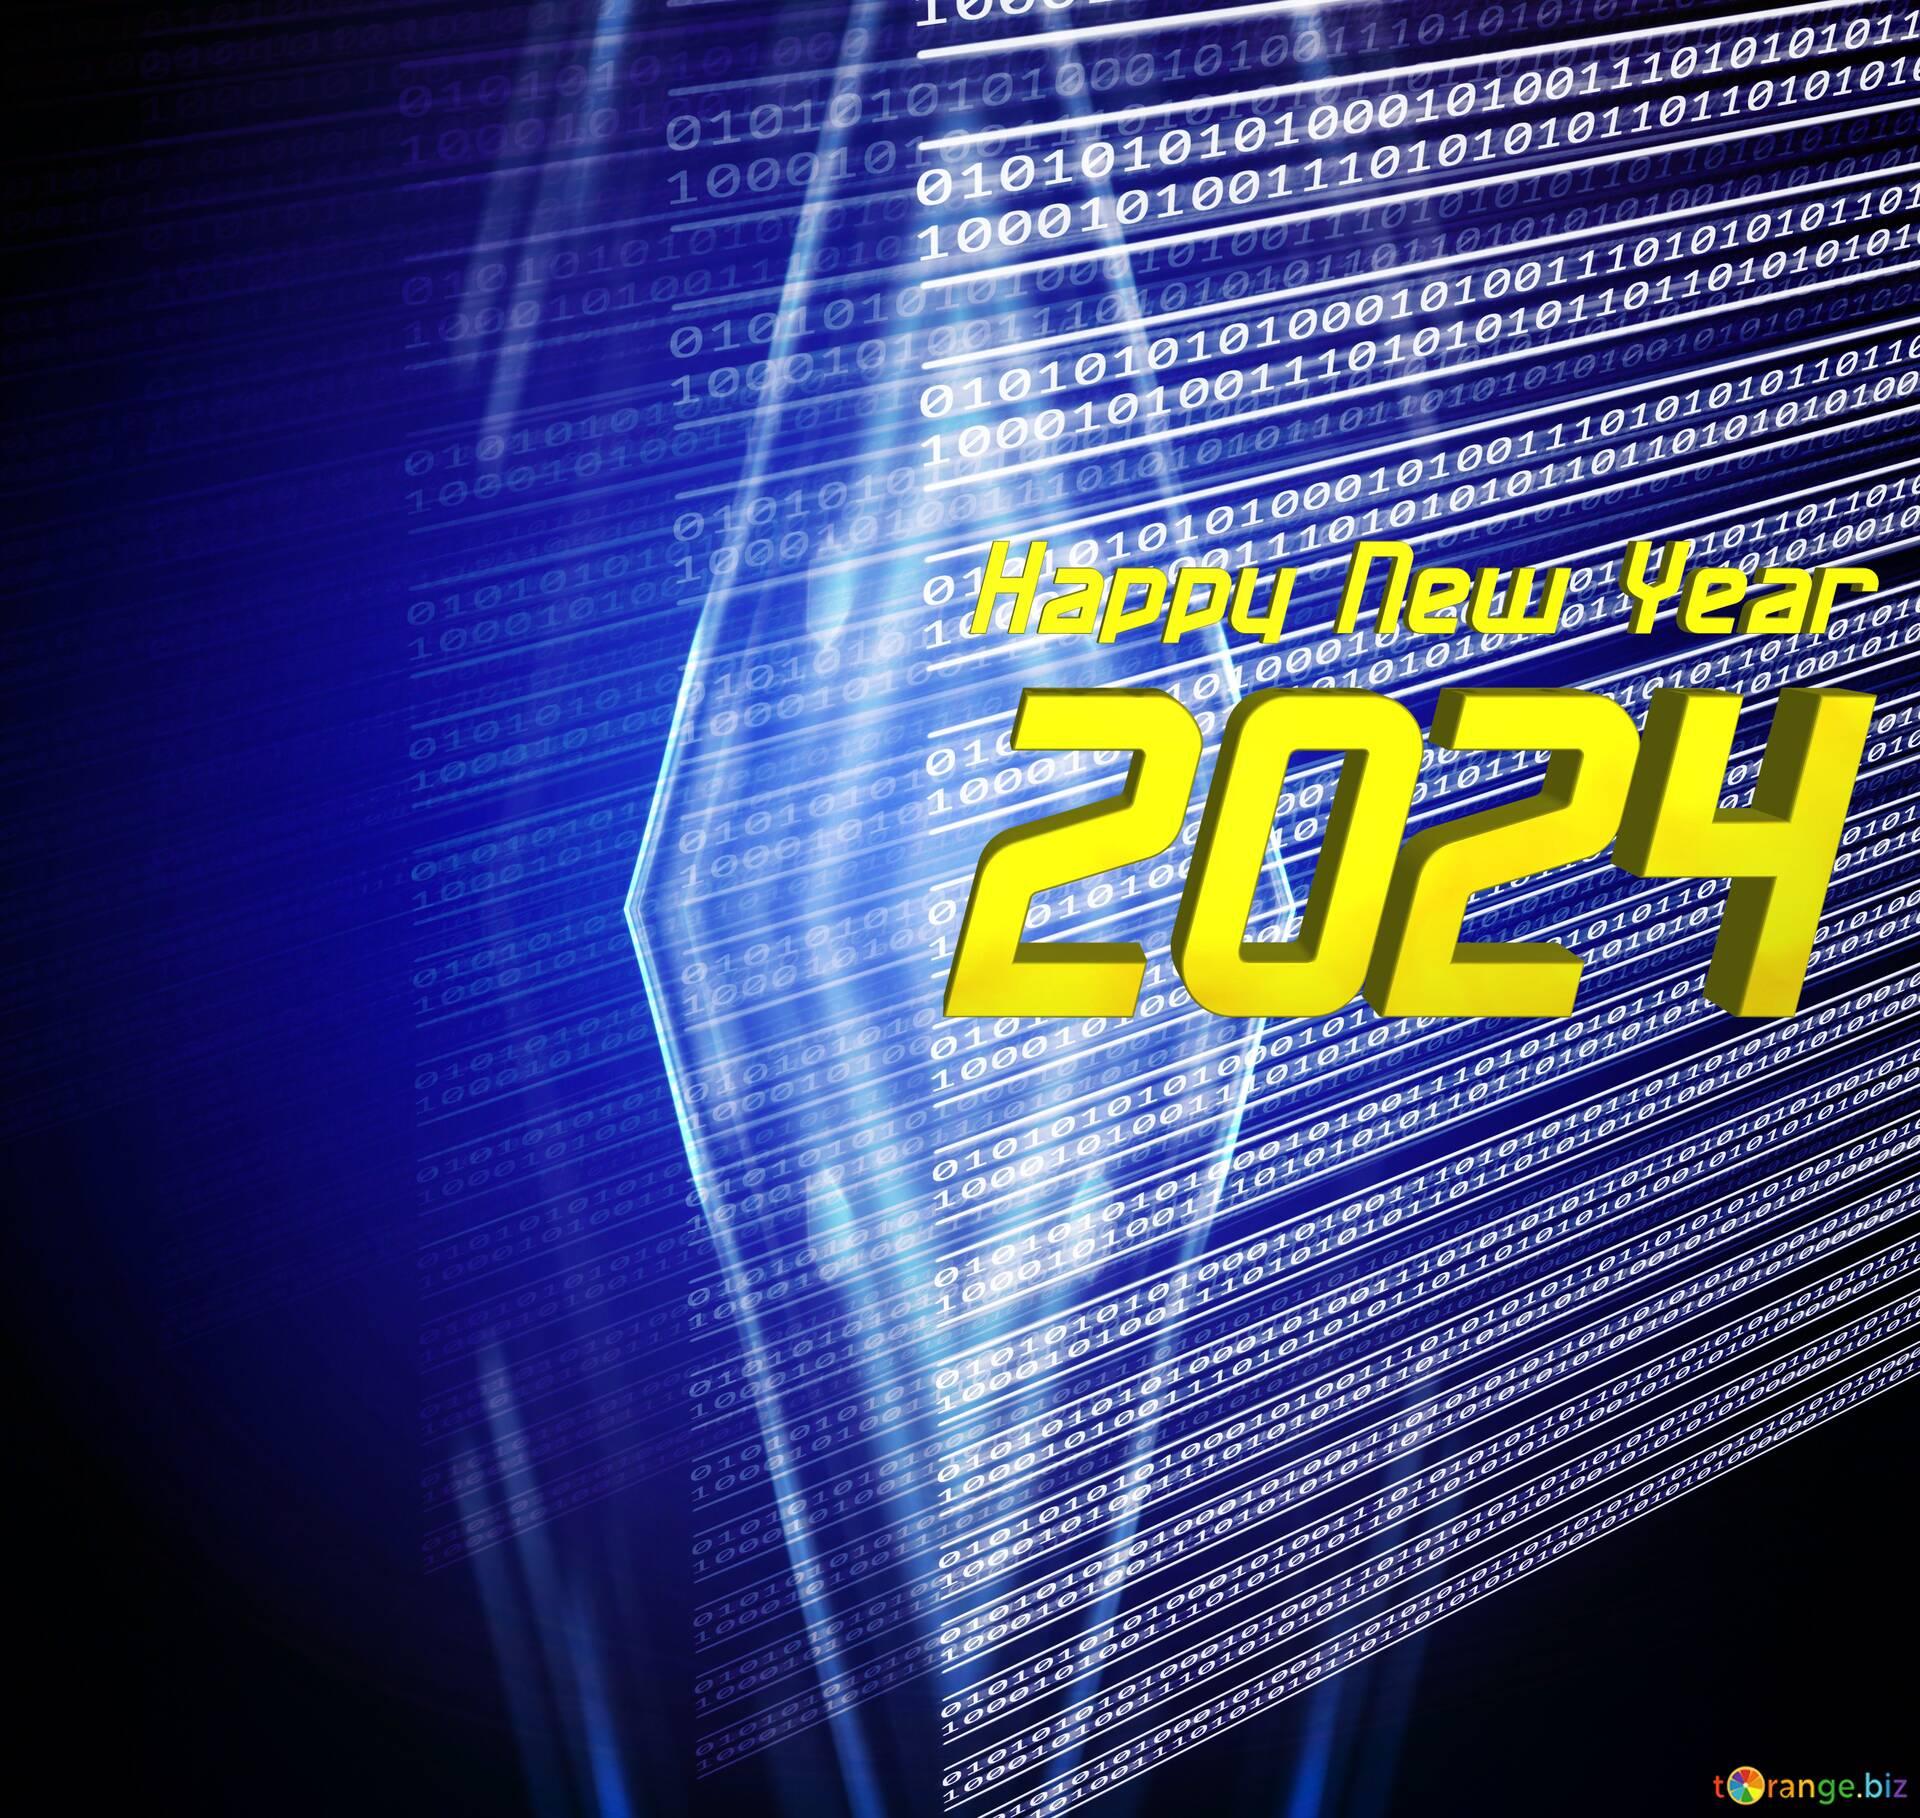 Download Free Picture Digital Computer Background Dark Hard Blue Happy New Year 2022 On Cc By License Free Image Stock Torange Biz Fx 209713